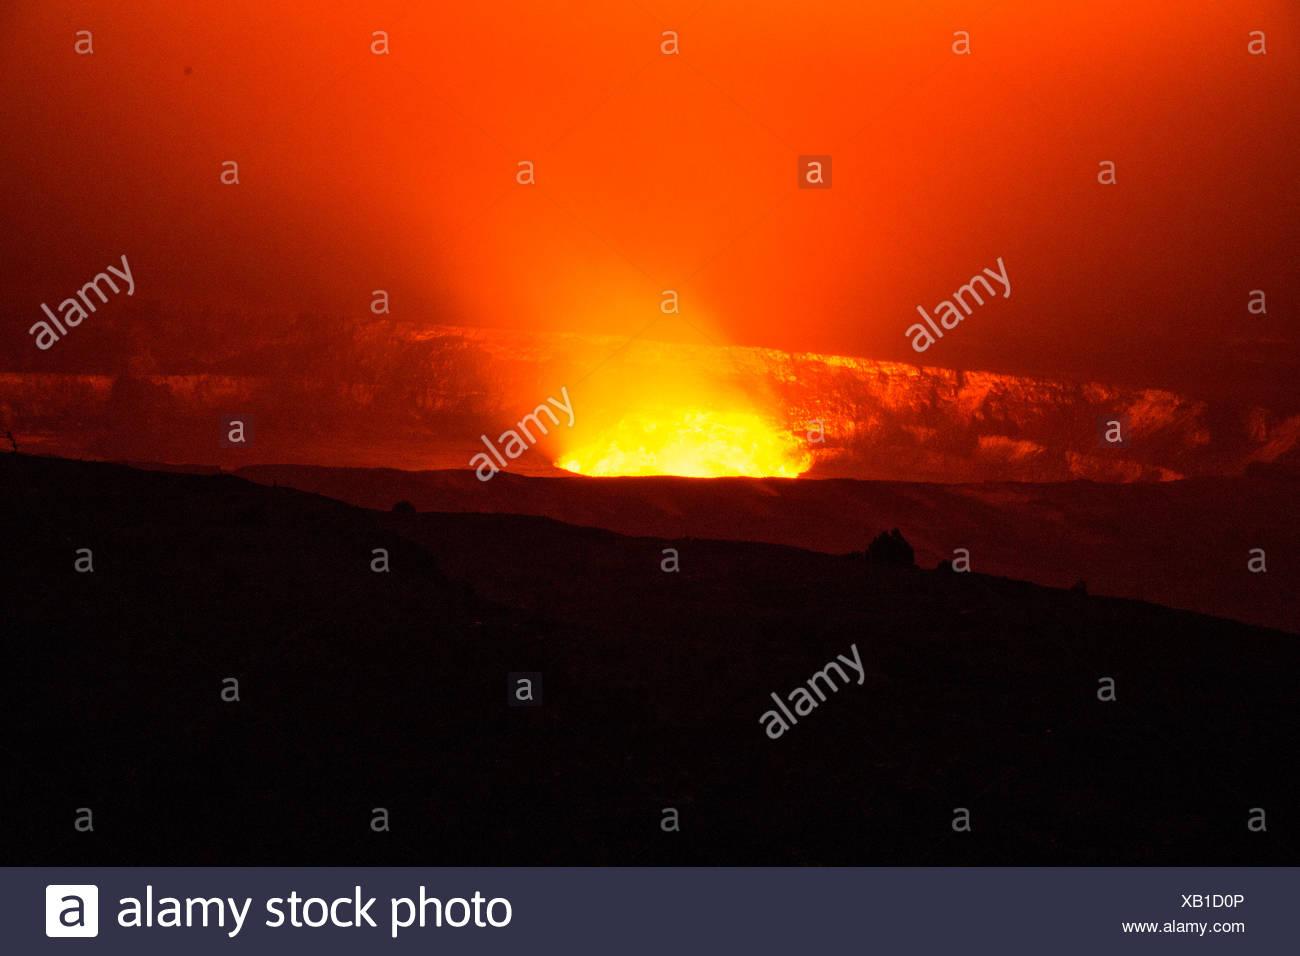 Big Island,Kilauea,volcano,Caldera,Vulcanoes,National Park,Big Island,USA,Hawaii,America,Volcanical,lava, - Stock Image